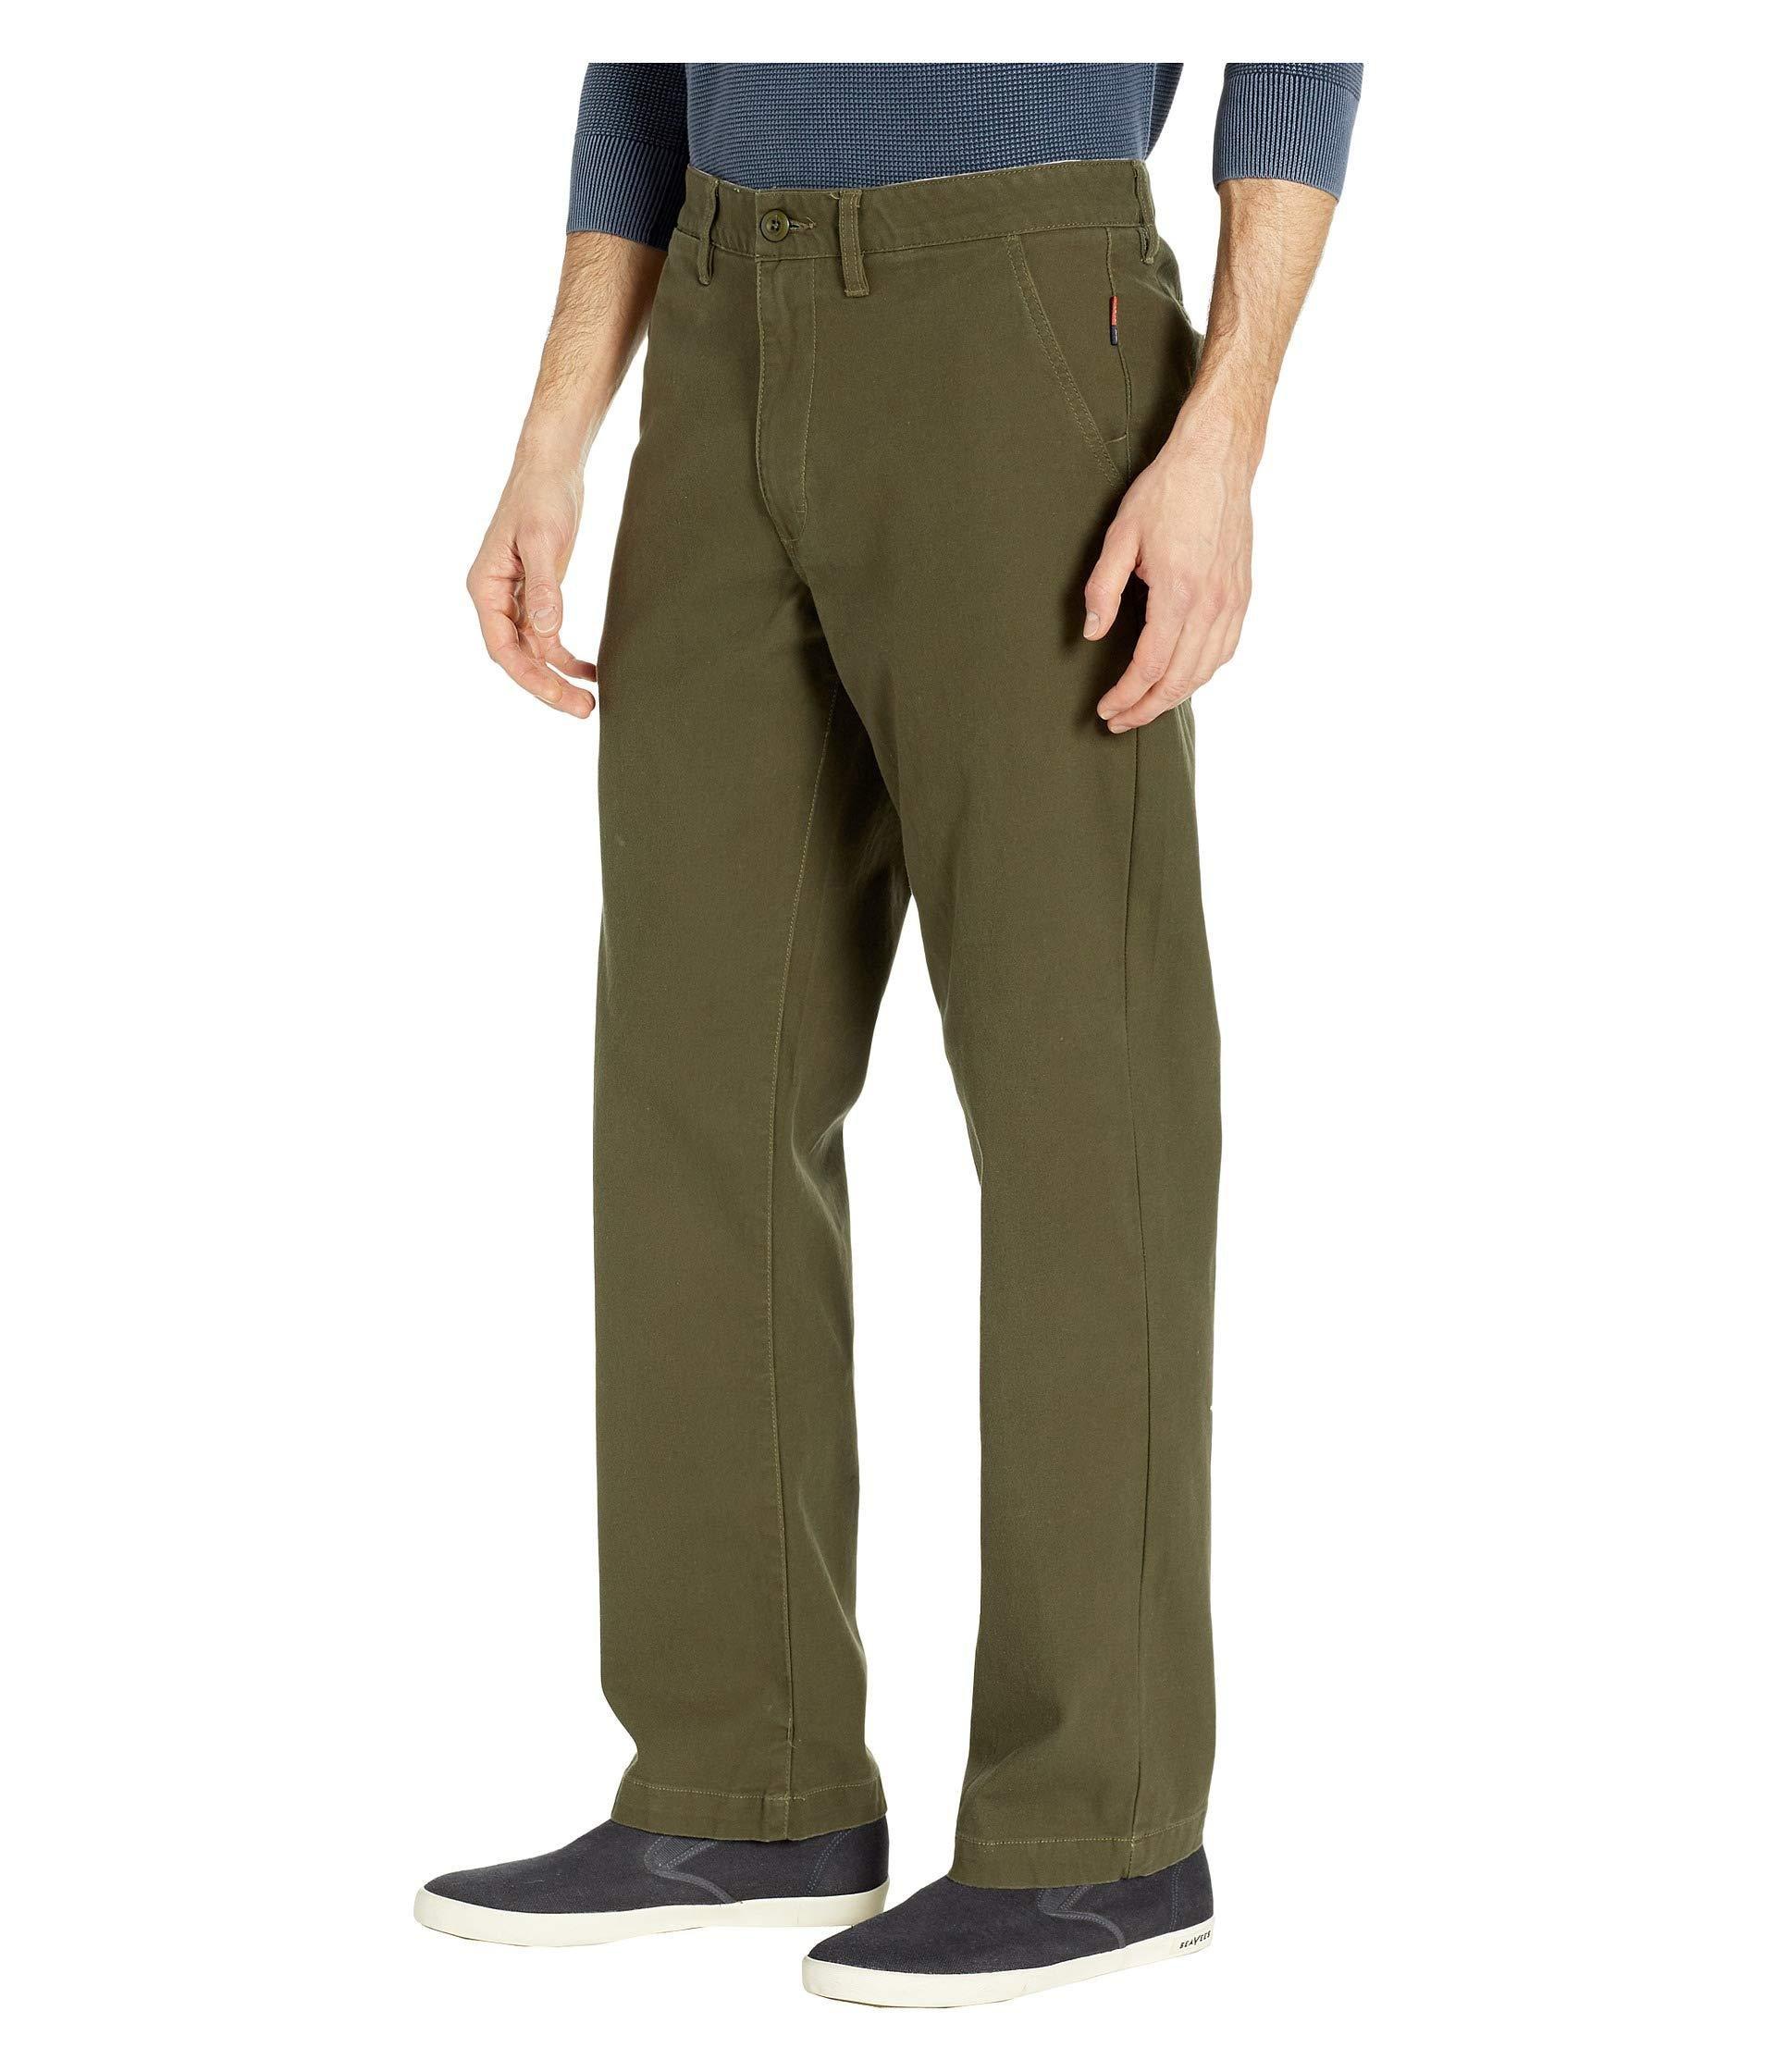 dd8c09889e Lyst - Globe G6 Appleyard Rage Pants (weed) Men's Casual Pants in Green for  Men